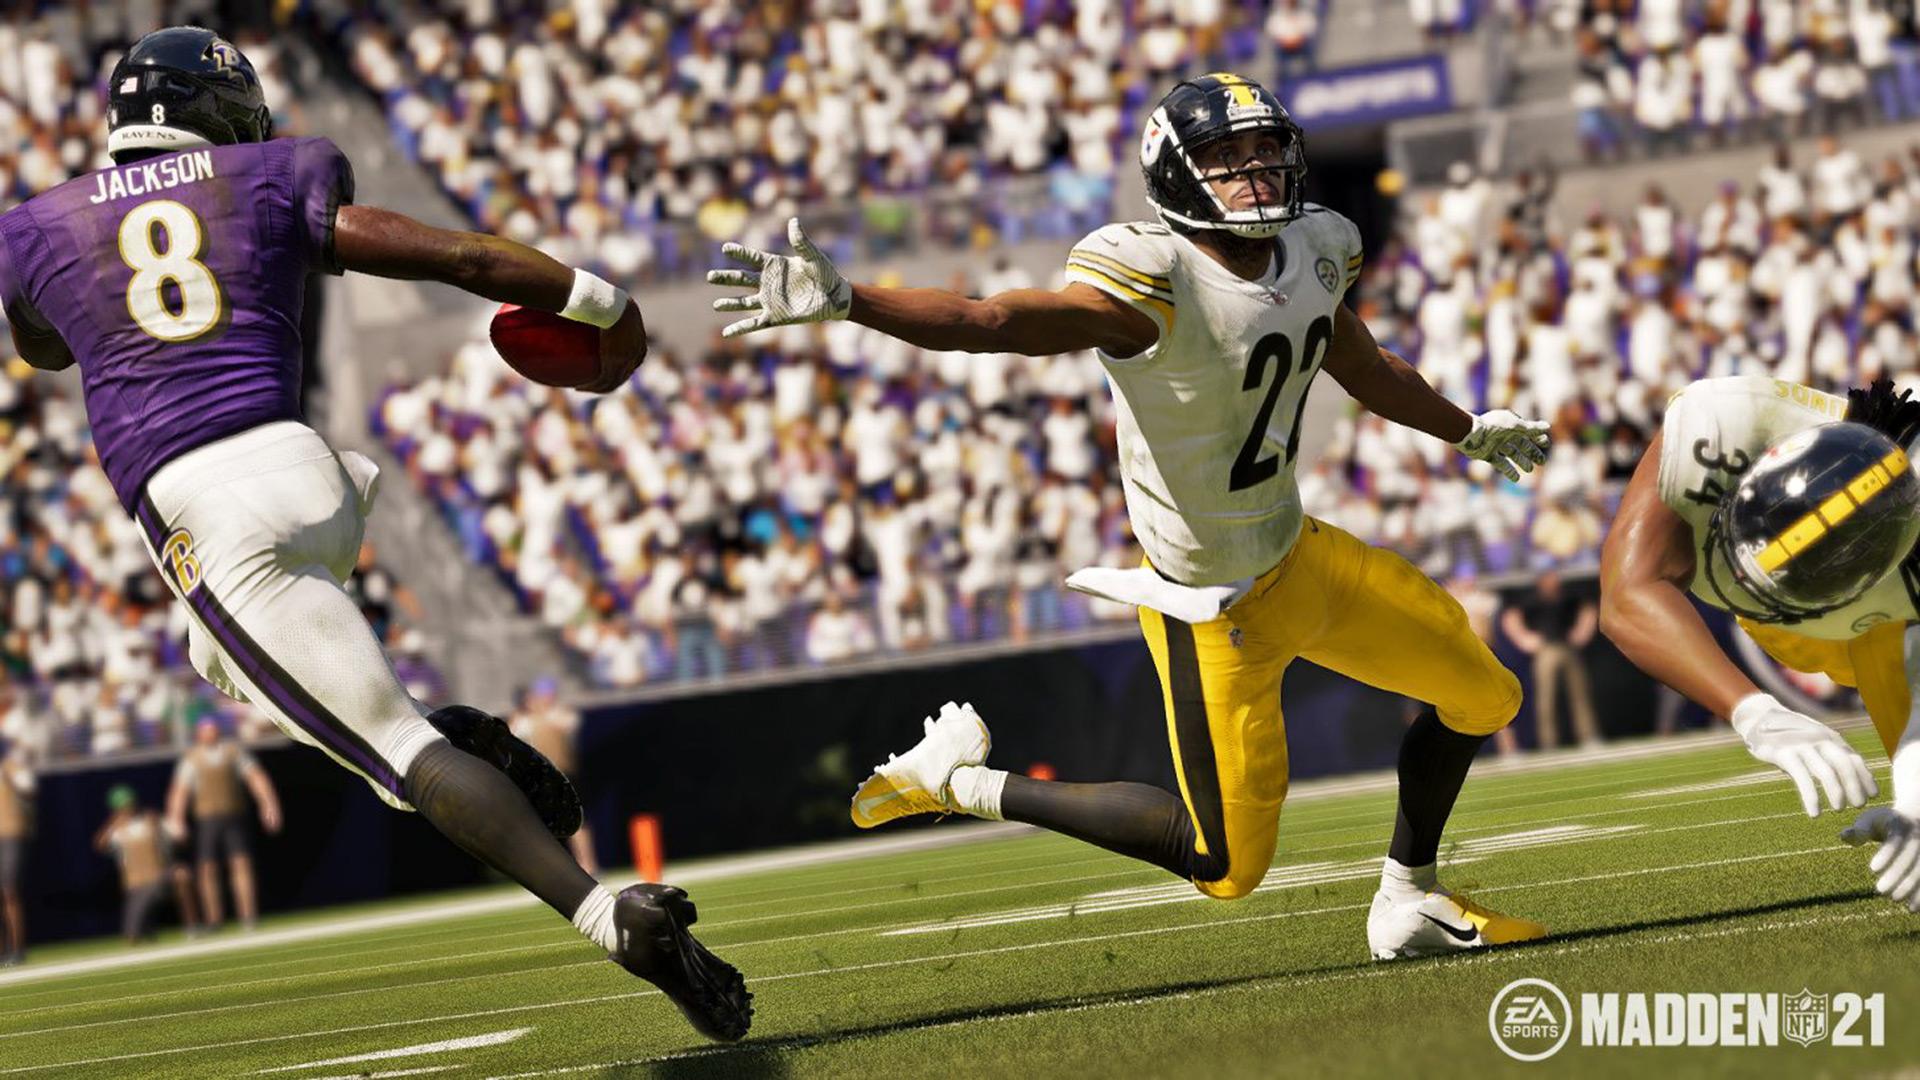 Quelle: EA - Madden NFL 21